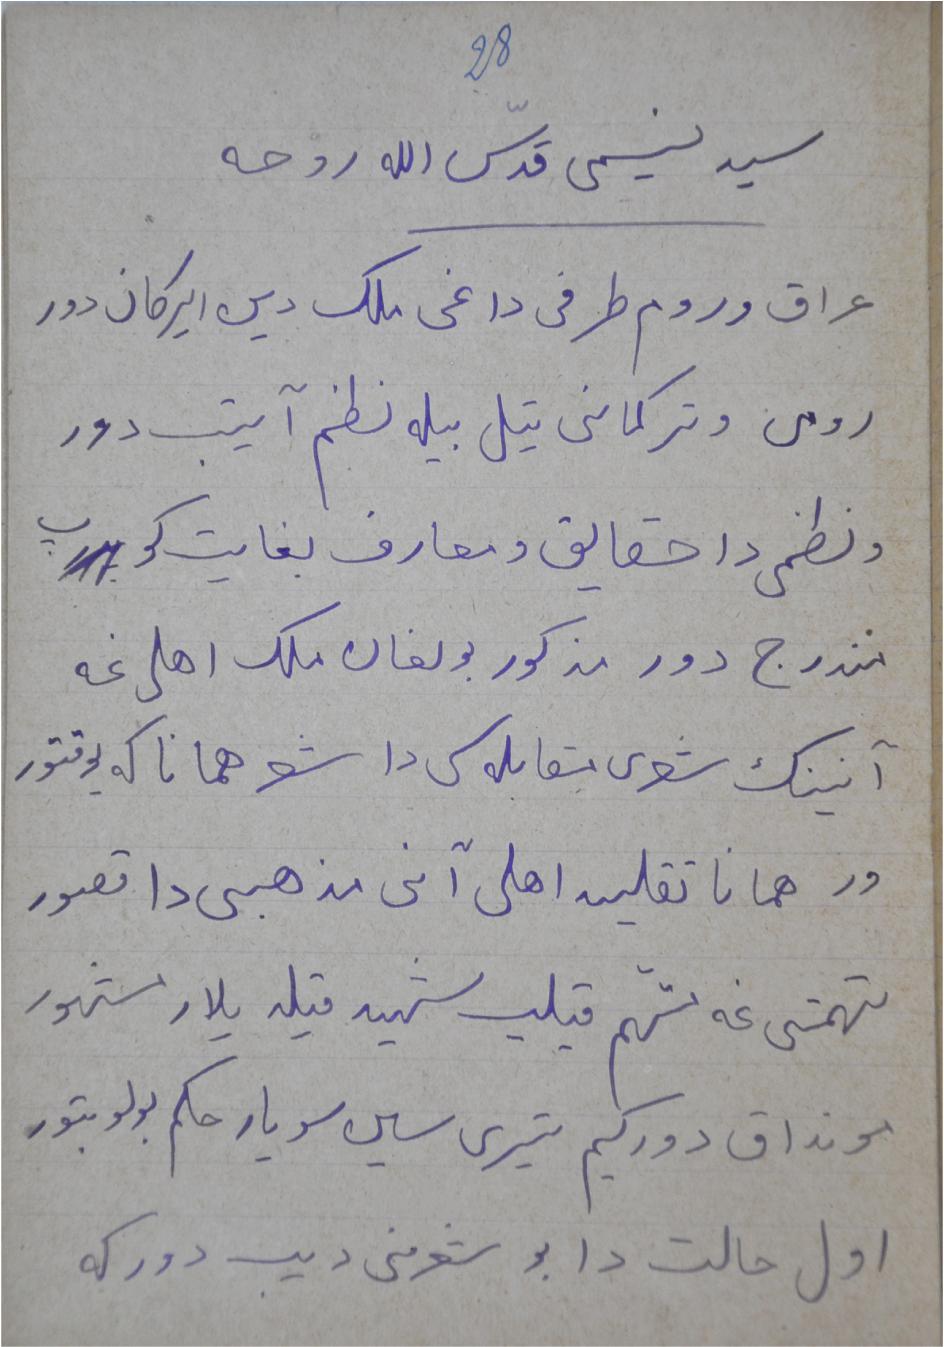 Red Terror against Islamic Manuscripts: The Case of the Manuscript